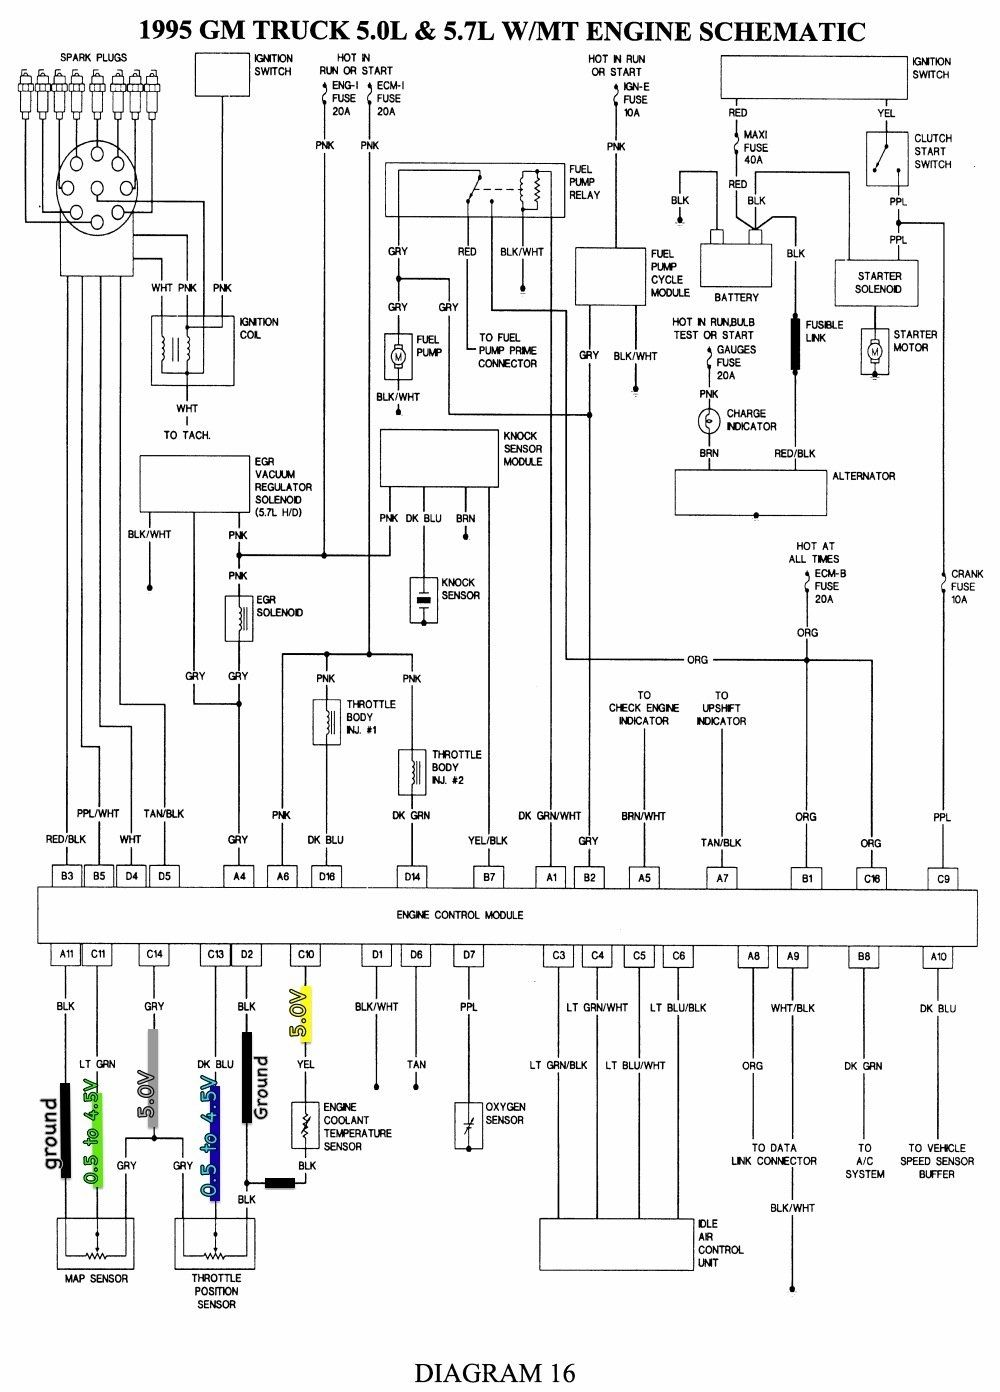 1992 Chevy Silverado Headlight Wiring Diagram Image